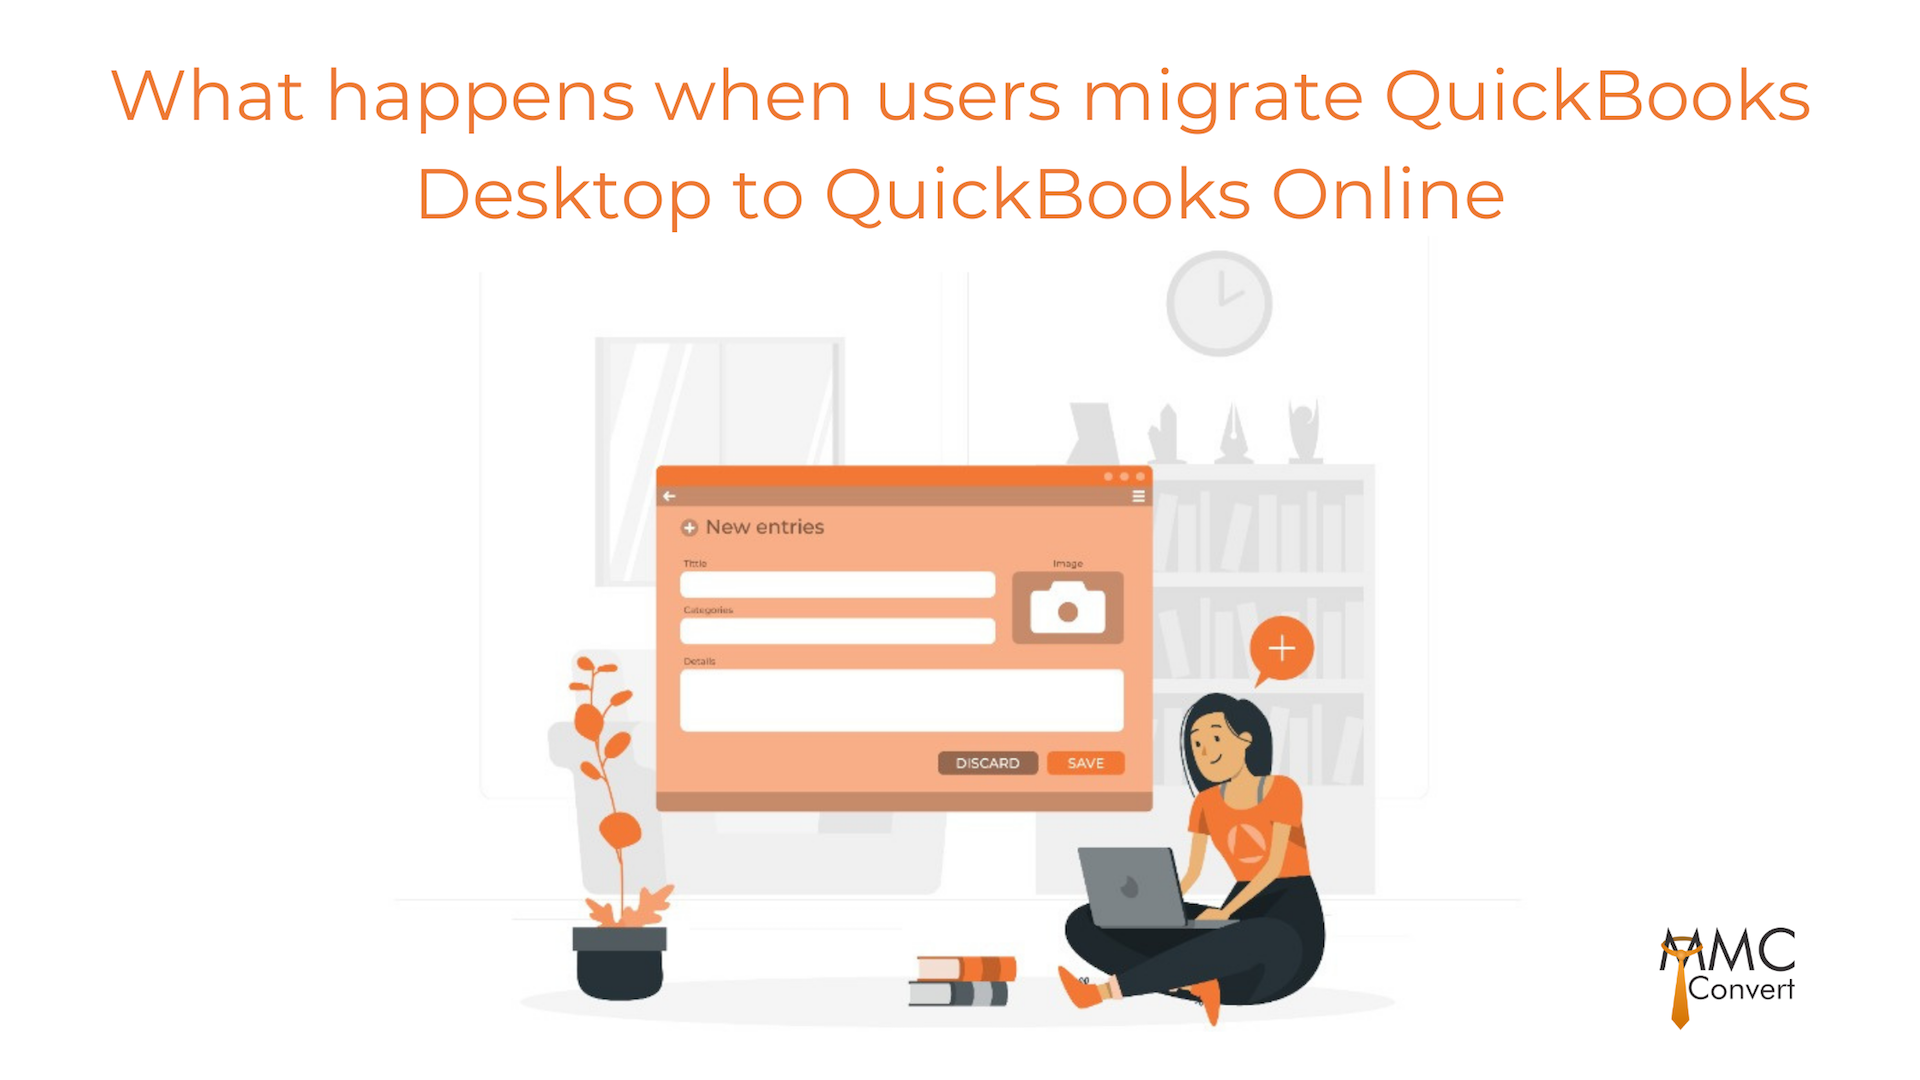 What happens when users migrate QuickBooks Desktop to QuickBooks Online?